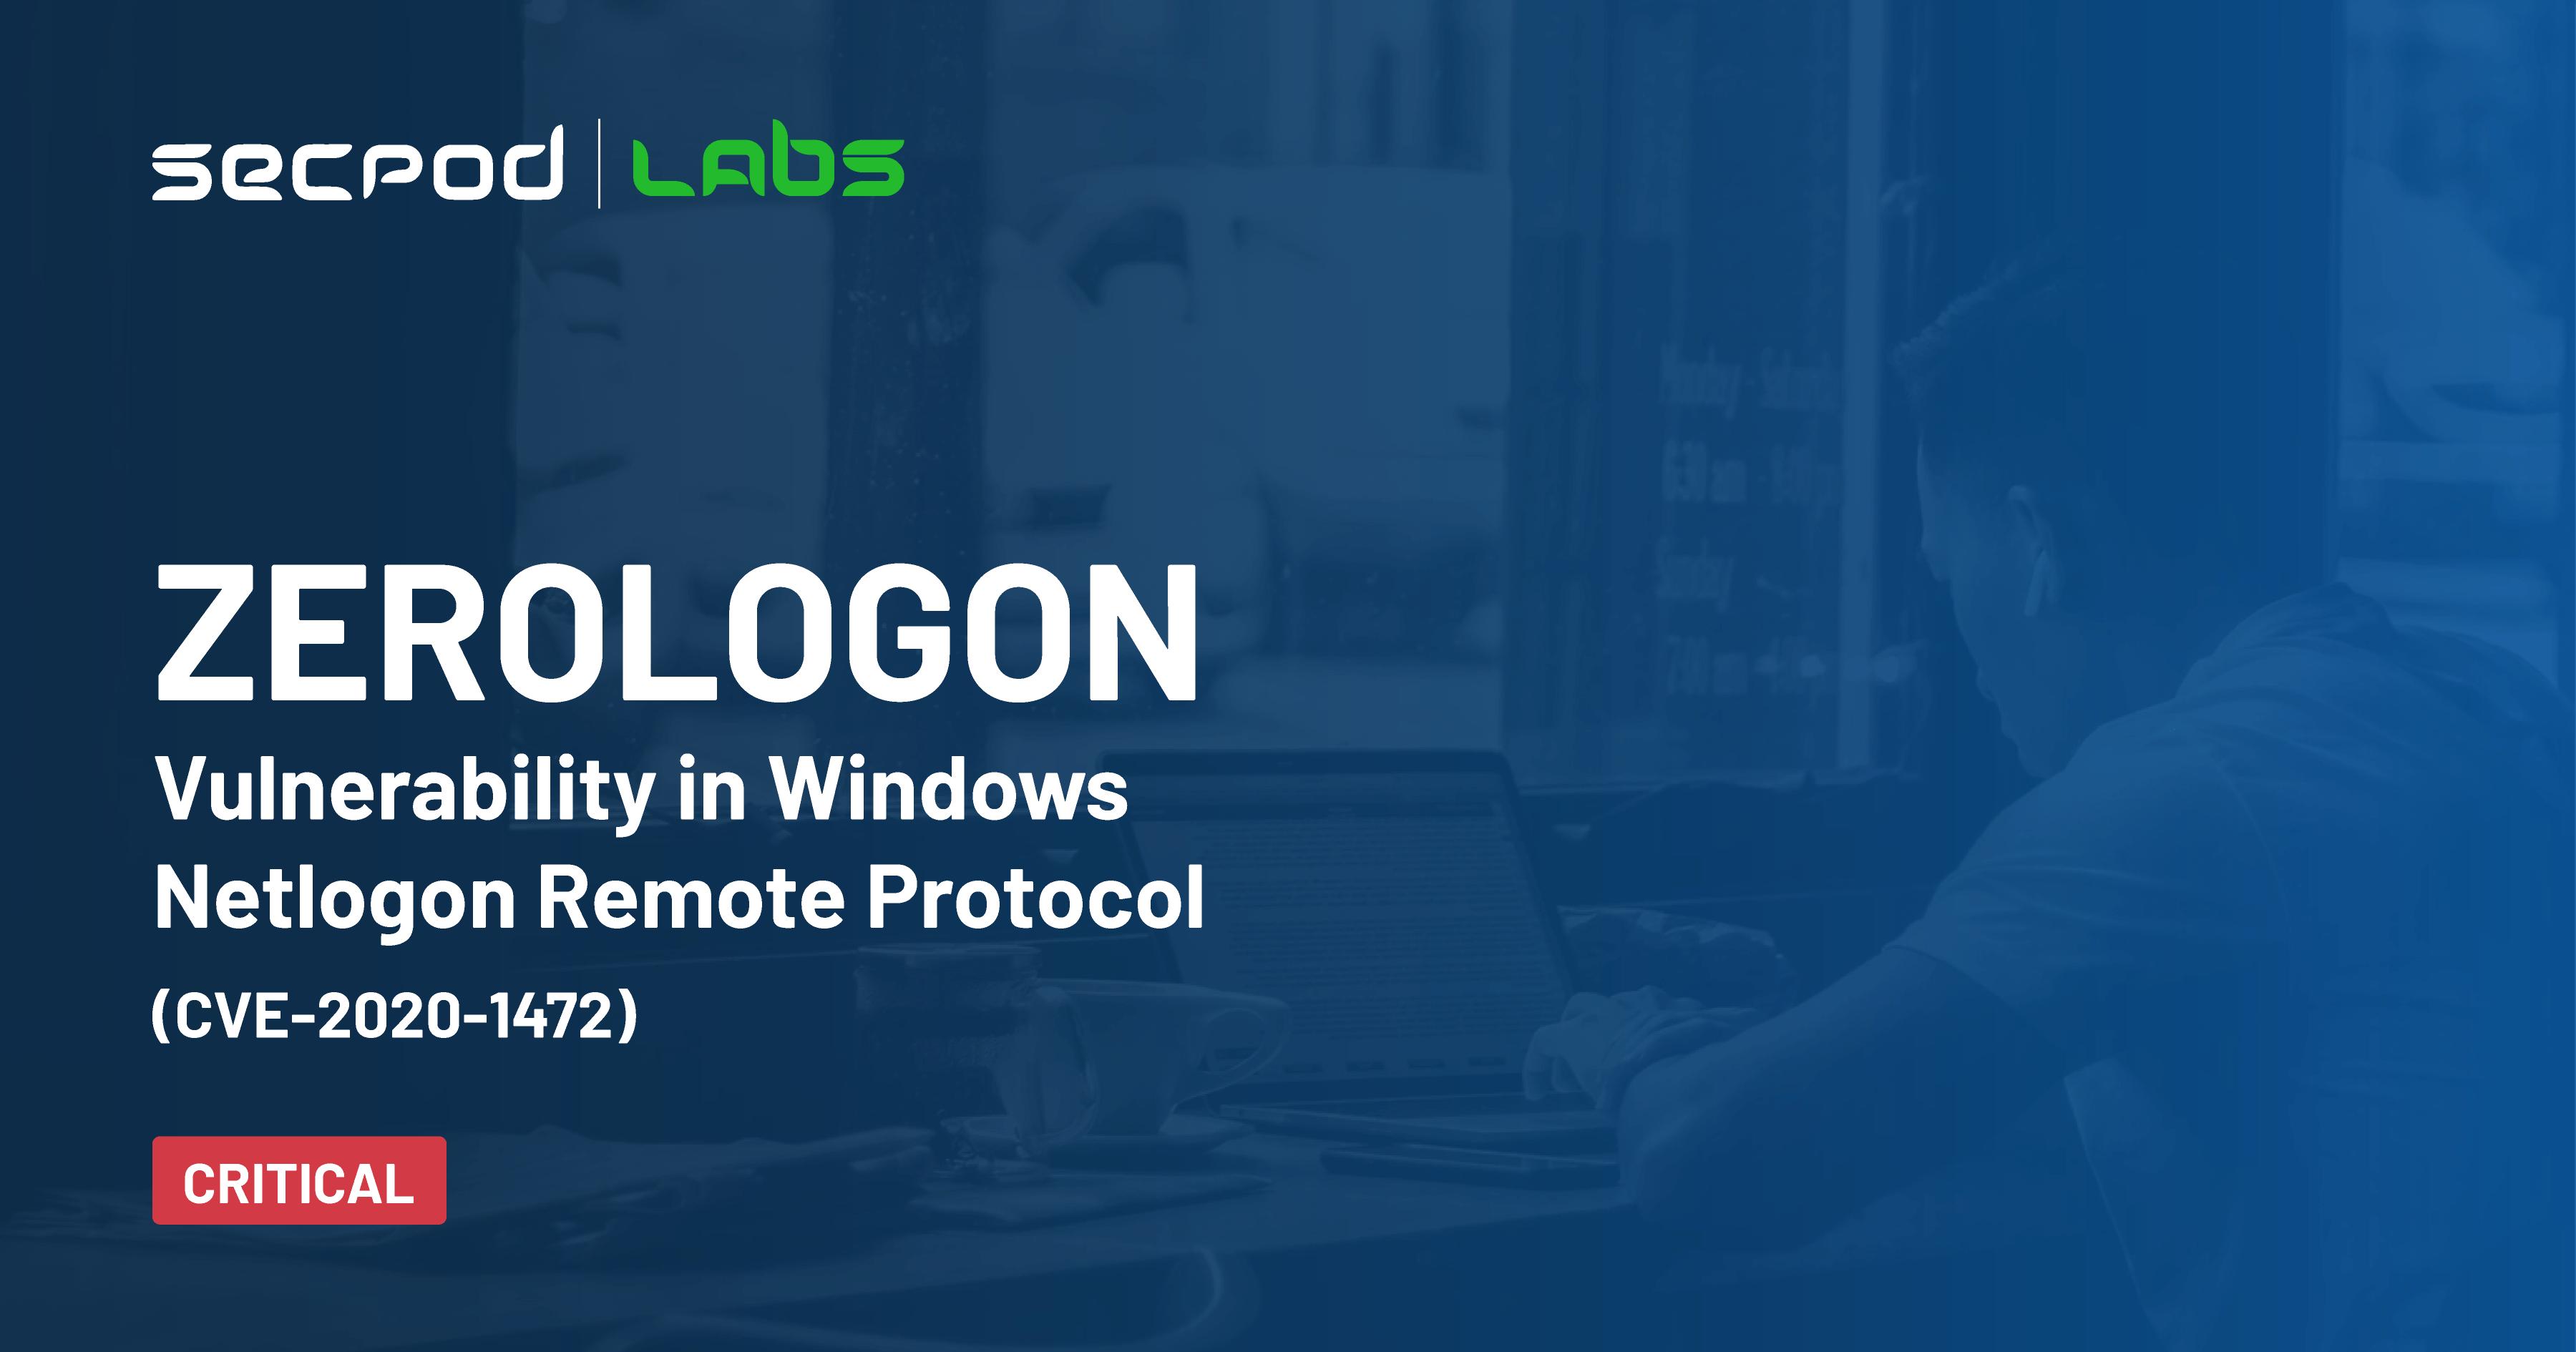 Alert! Zerologon: Your Windows Domain Controller Can't Handle Zero Properly (CVE-2020-1472)